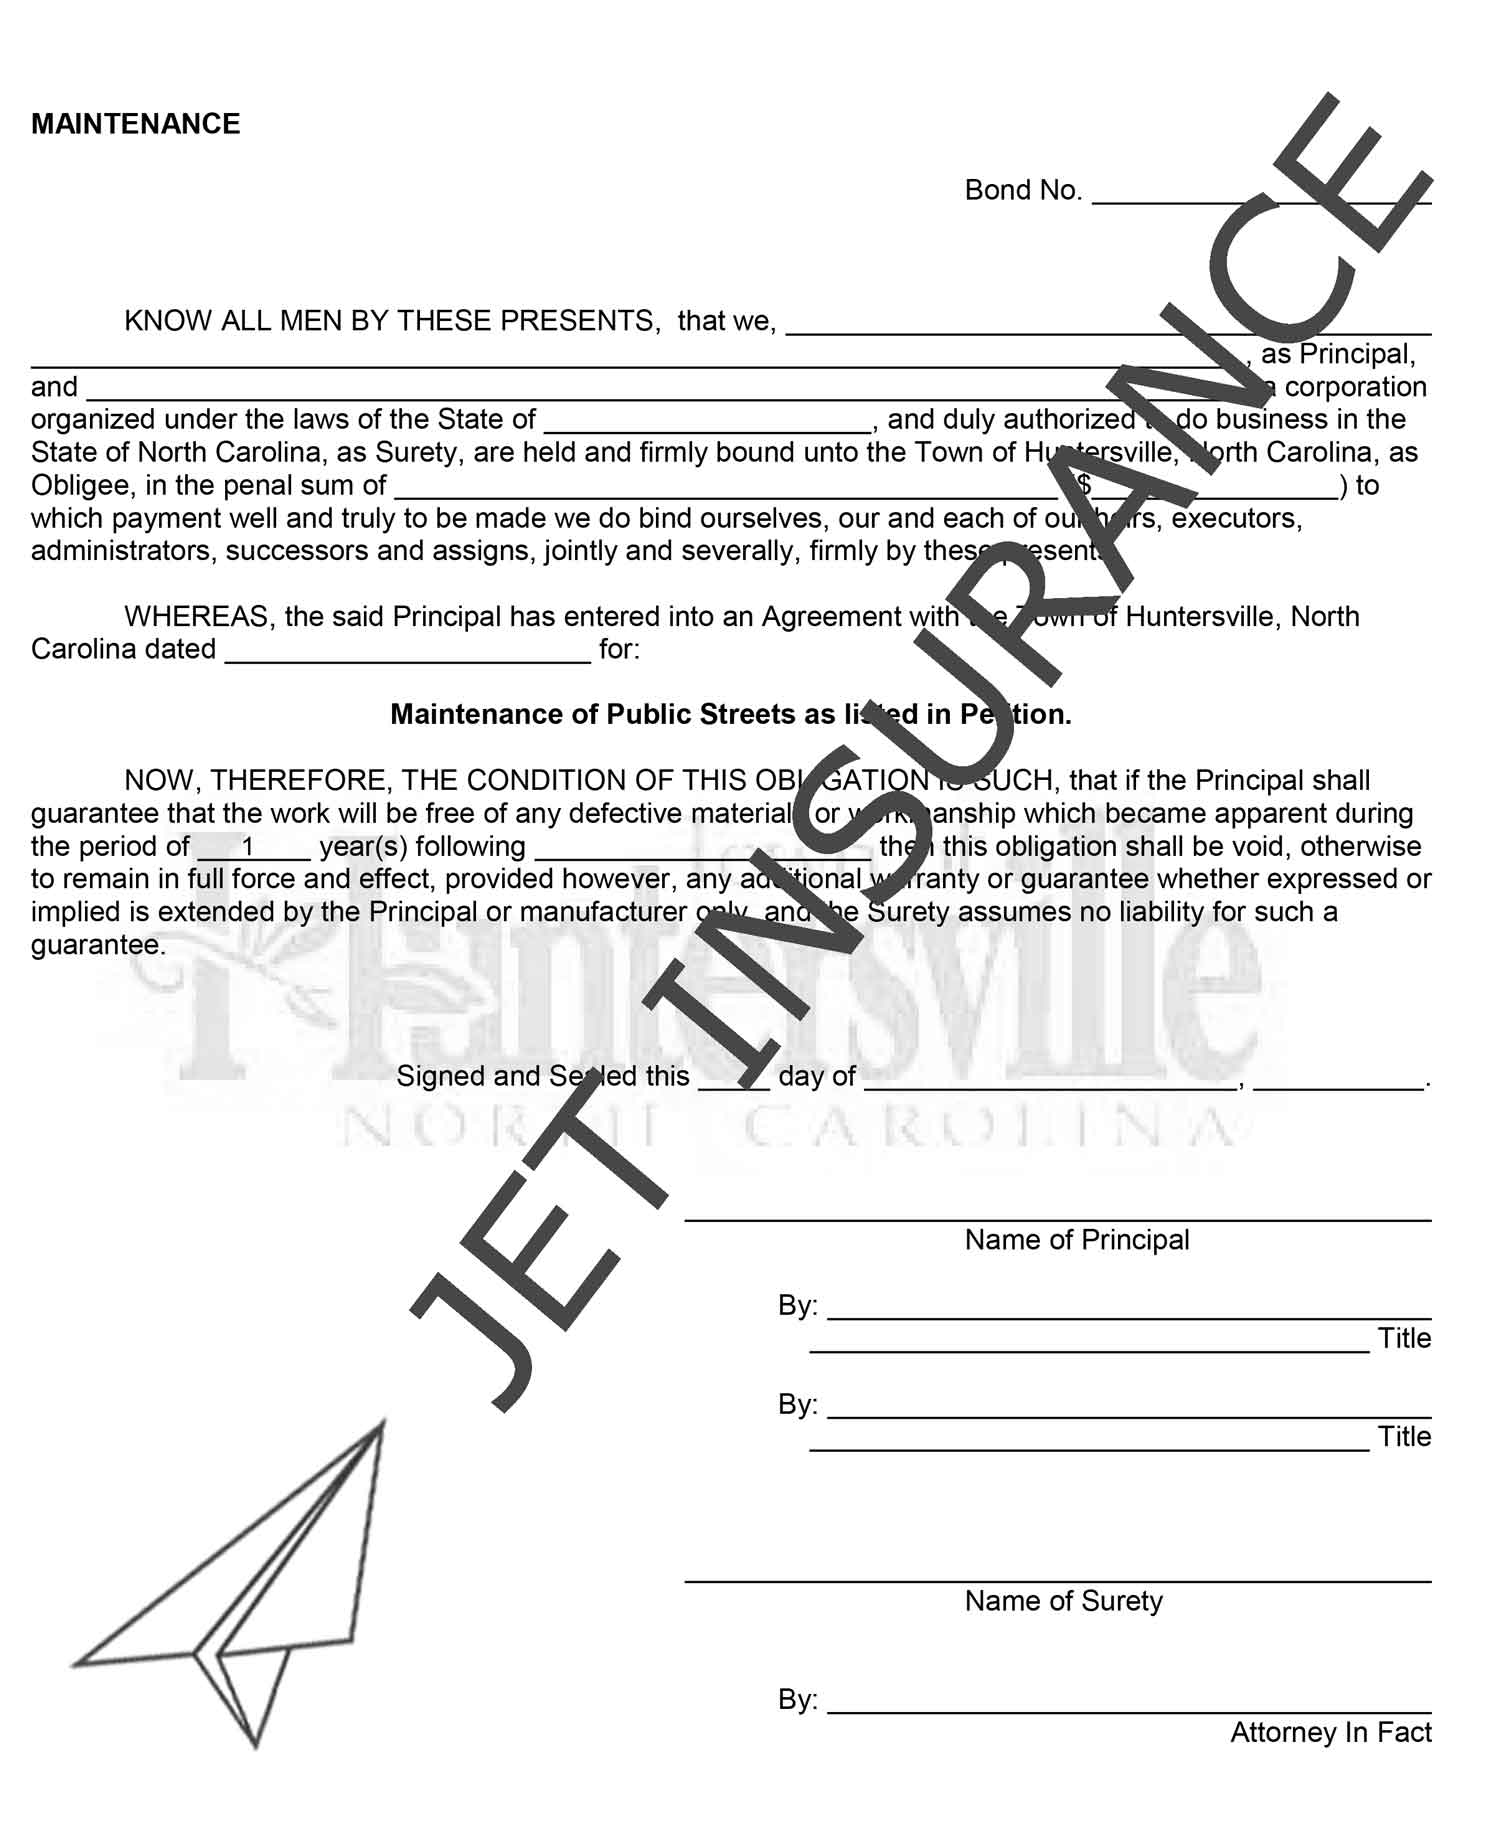 Huntersville North Carolina Land Development and Maintenance Bond Form